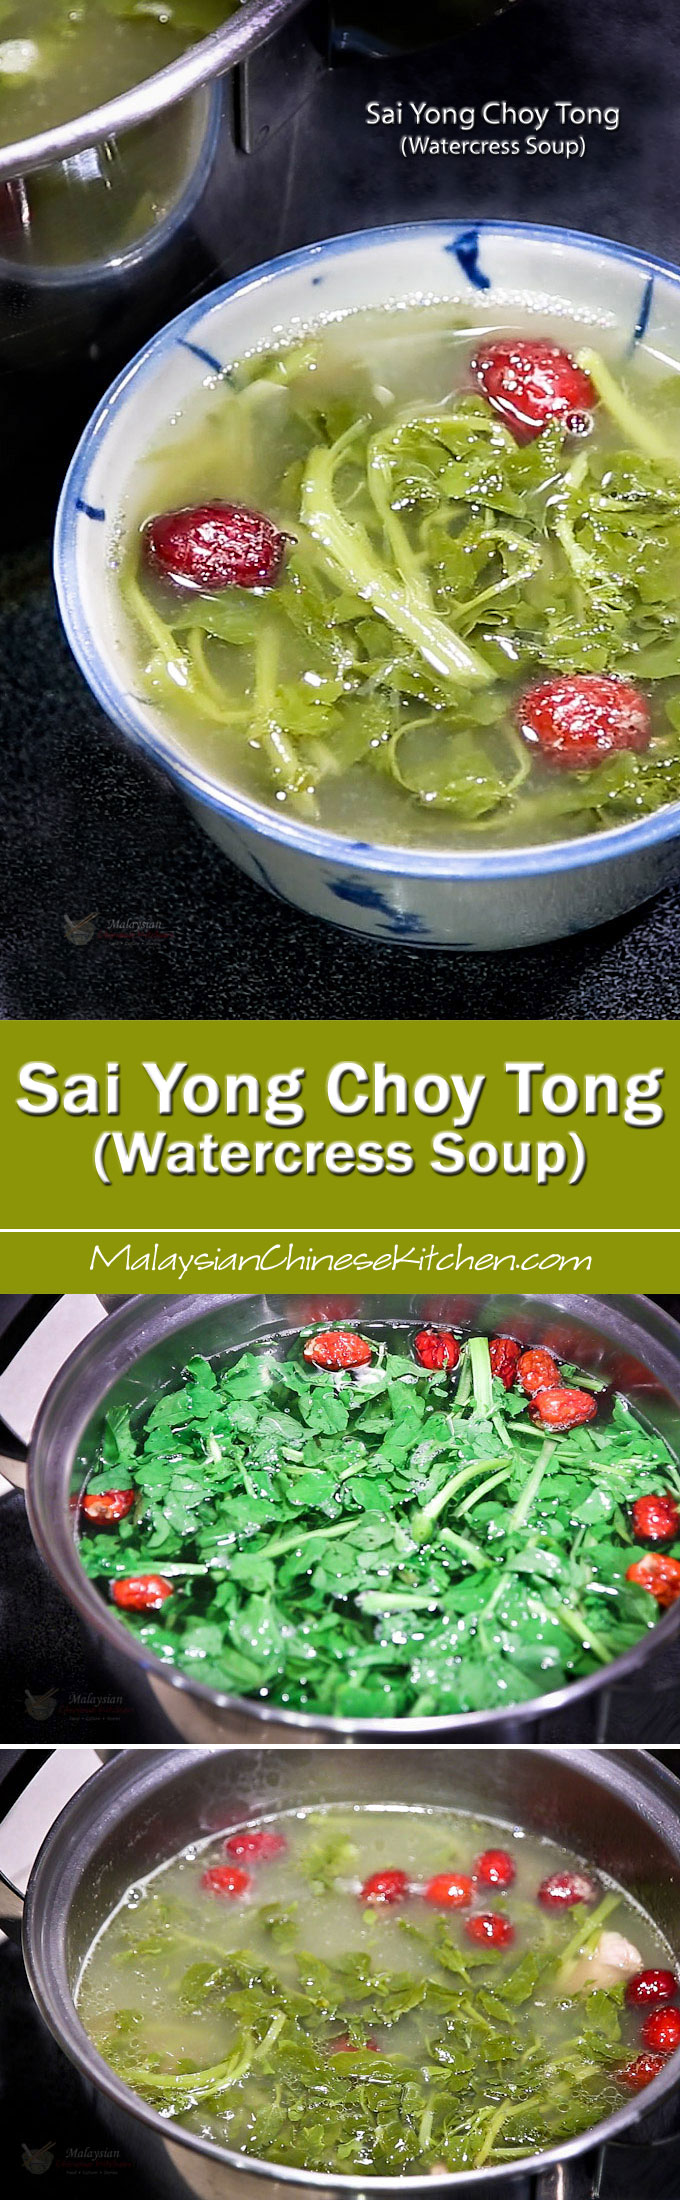 Sai Yong Choy Tong (Watercress Soup) is a slow boil, clear, and nourishing soup. It is very popular among the Malaysian Chinese.   MalaysianChineseKitchen.com